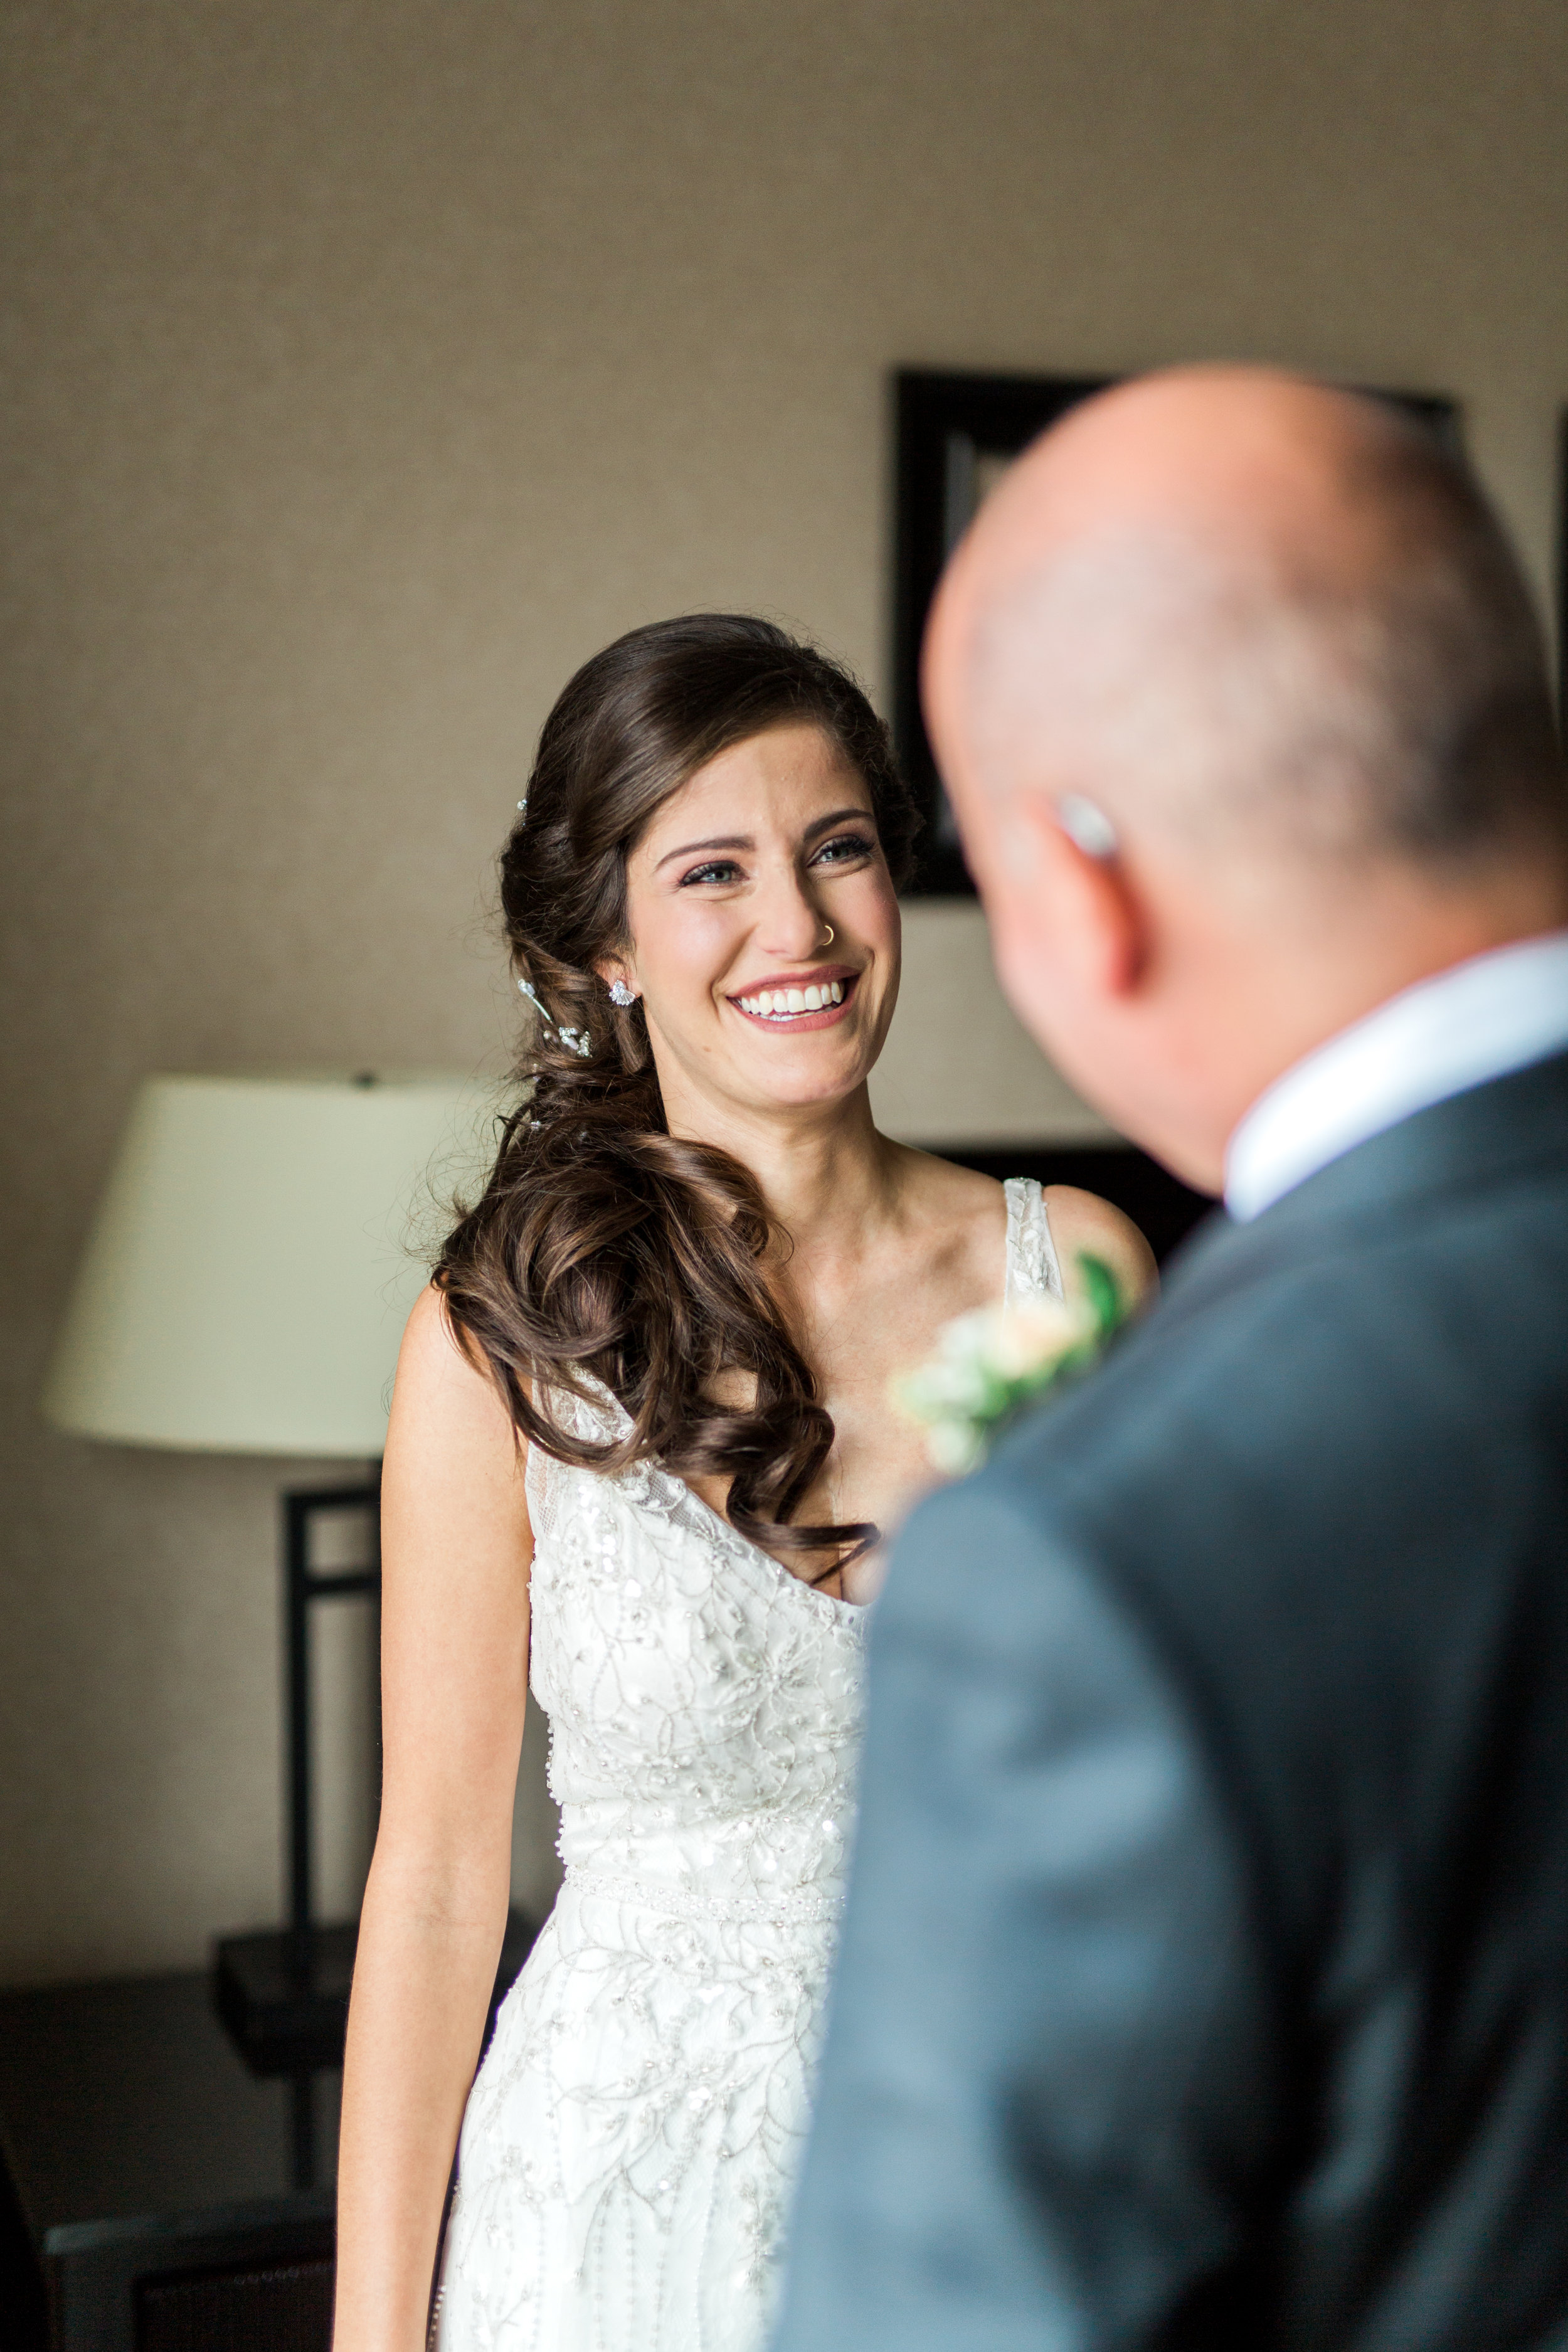 Amir-Golbazi-Danielle-Giroux-Photography_Toronto-Wedding_Cedarwood_Rachel-Paul_113.jpg